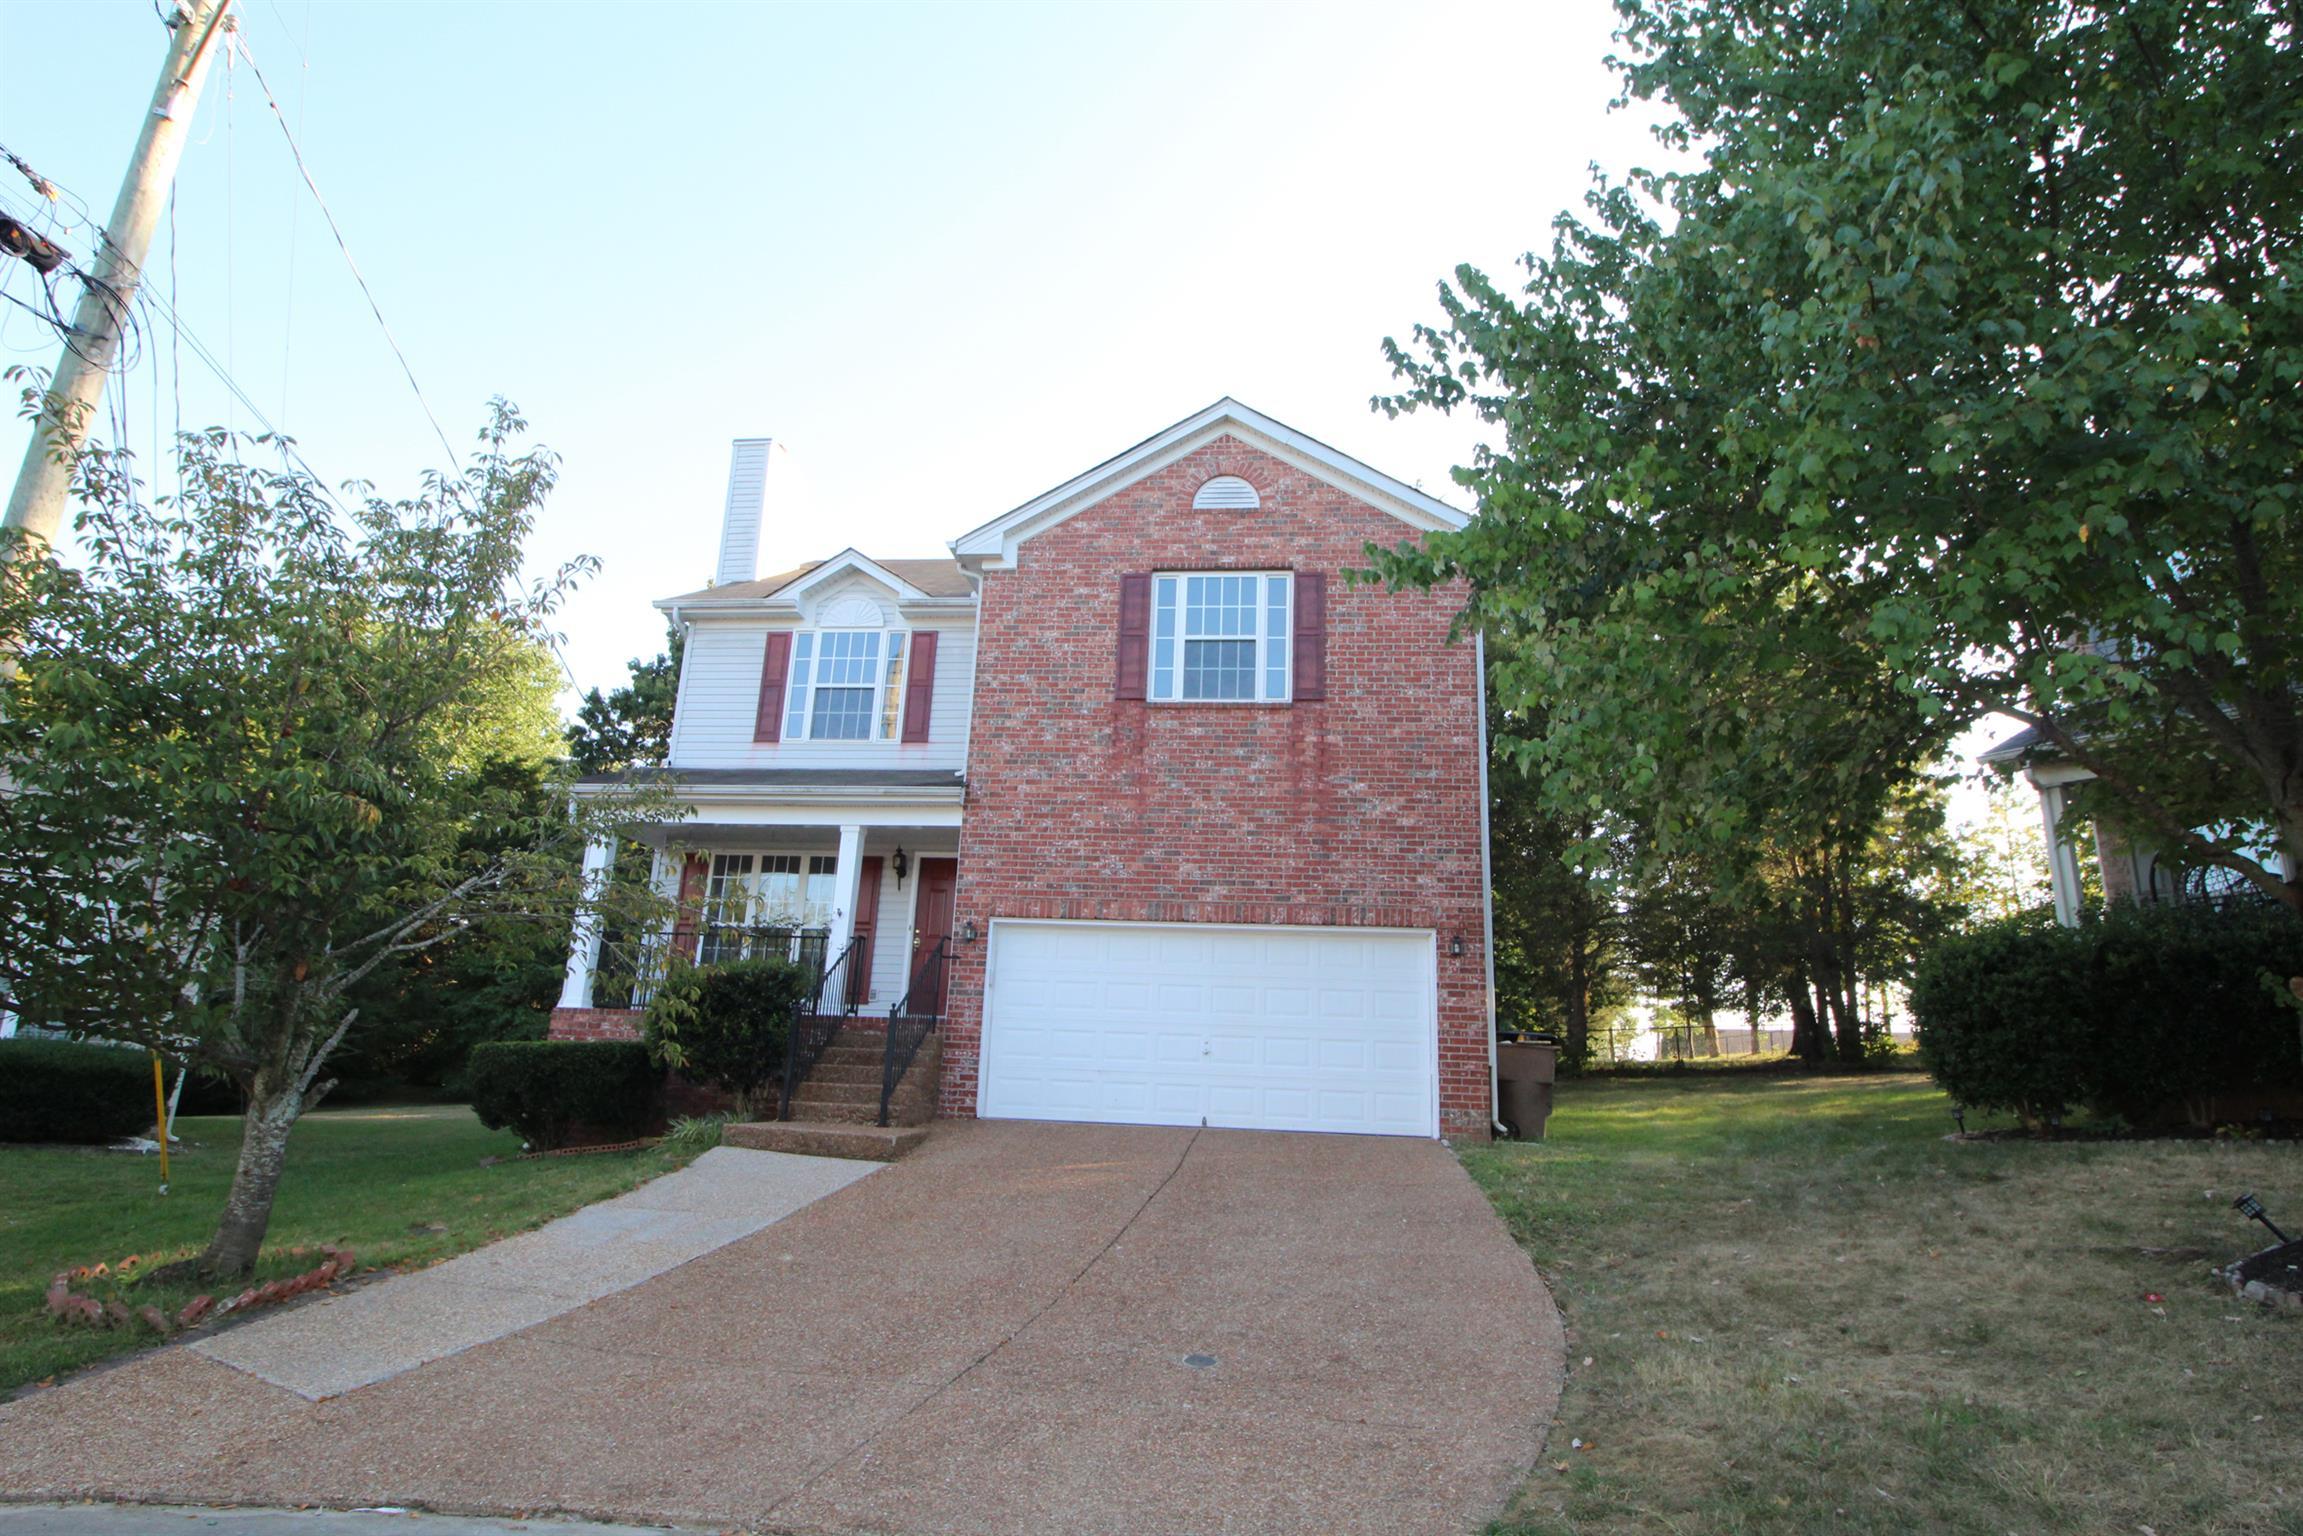 3228 Demetros Ct, Nashville, TN 37217 - Nashville, TN real estate listing